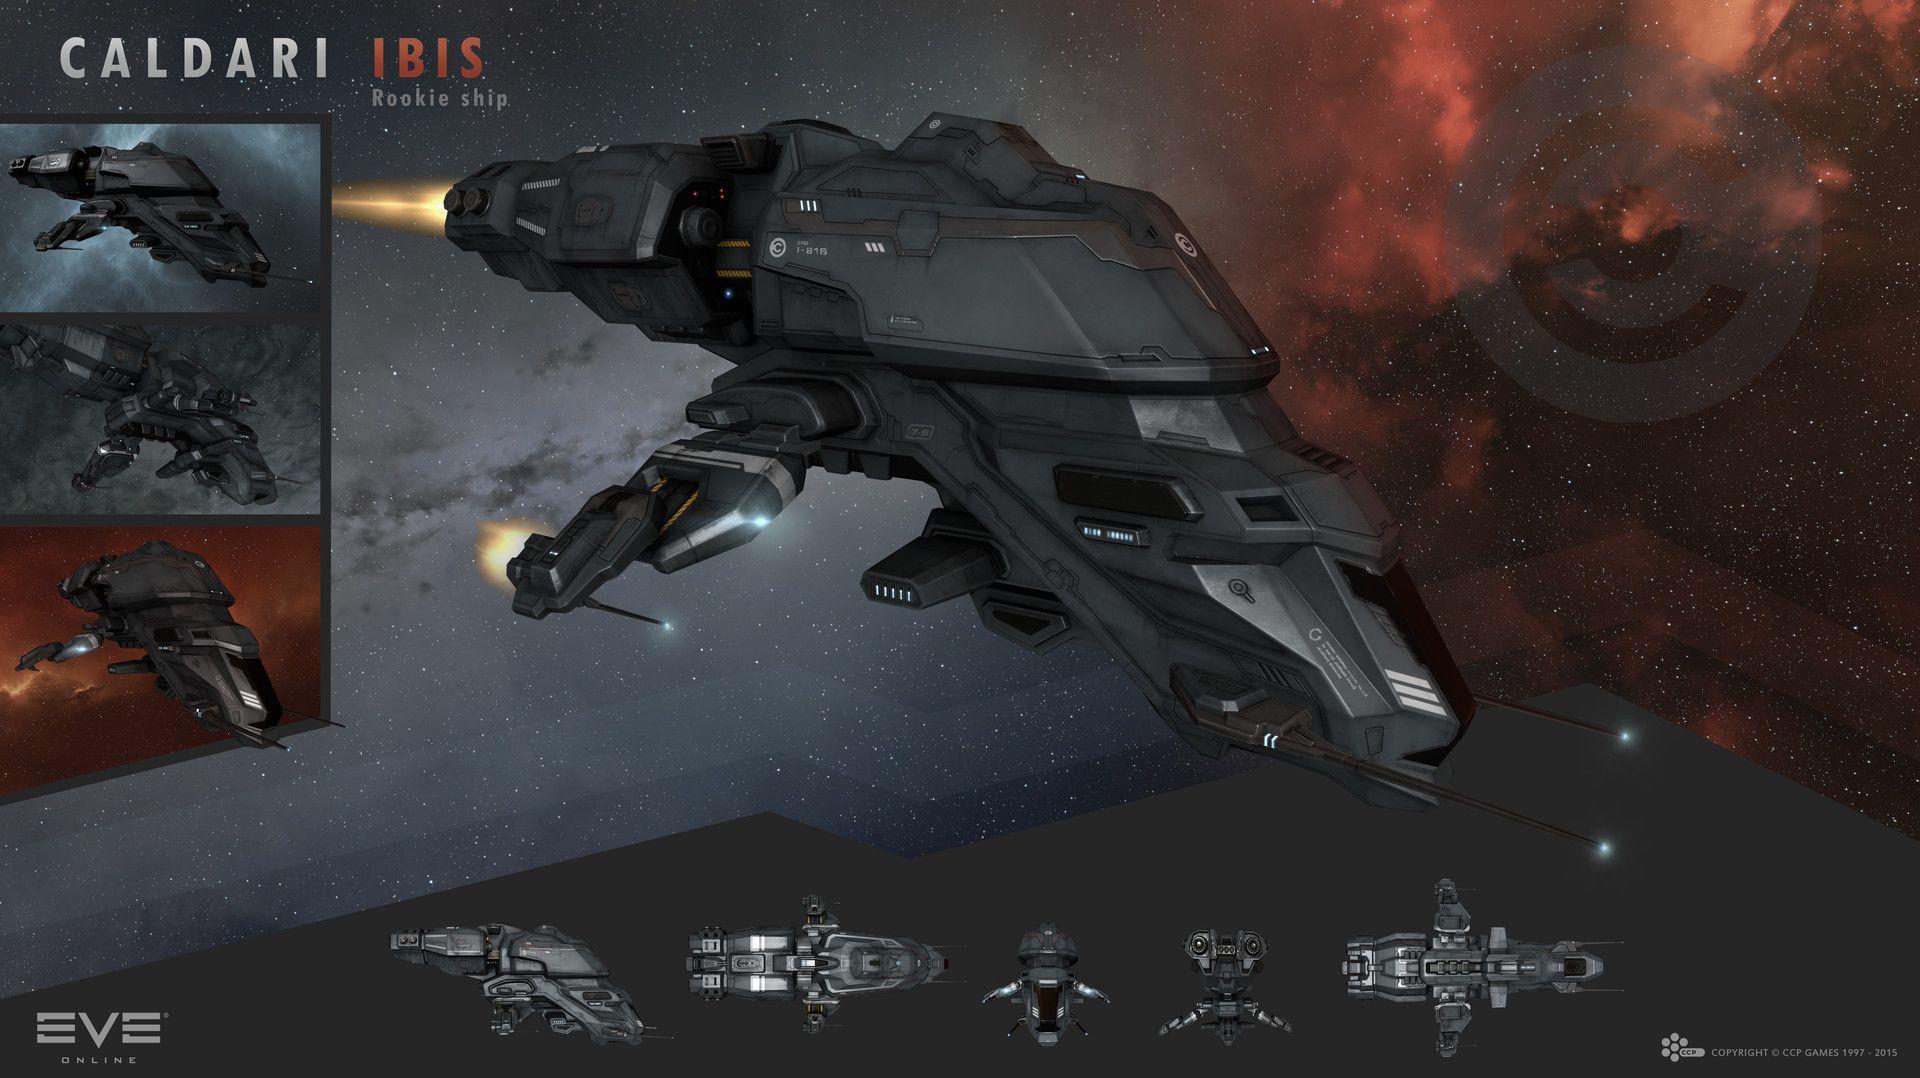 The new rookie ship Caldari Ibis that I created for EVE